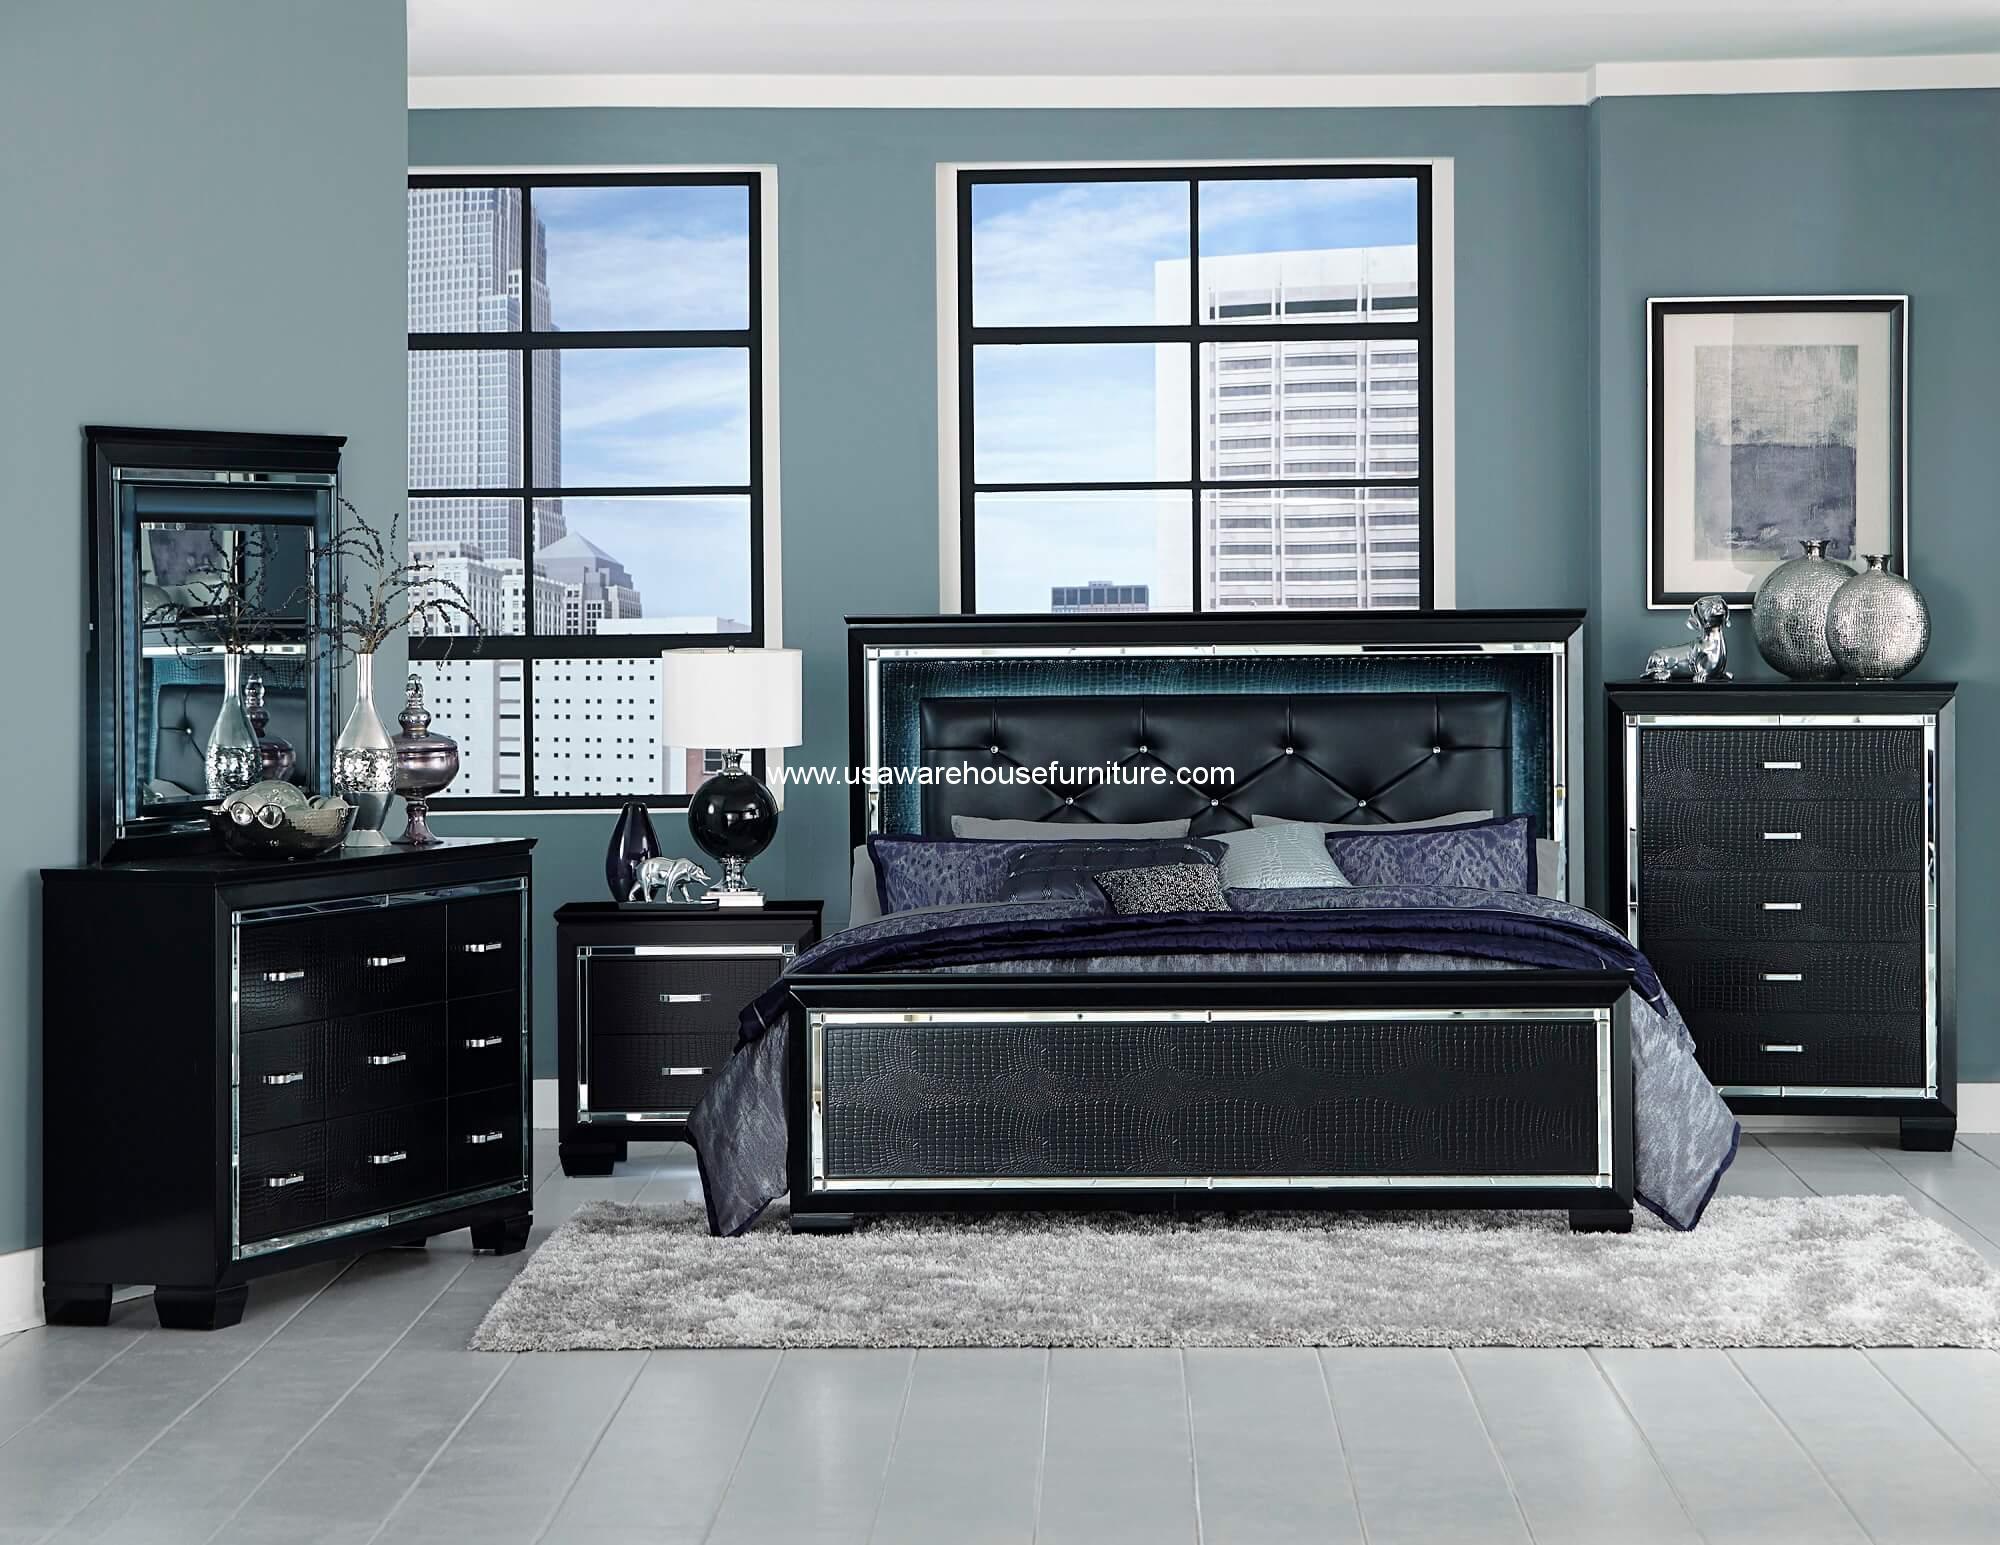 4 piece allura led panel bedroom set usa warehouse furniture for 4 piece bedroom furniture set